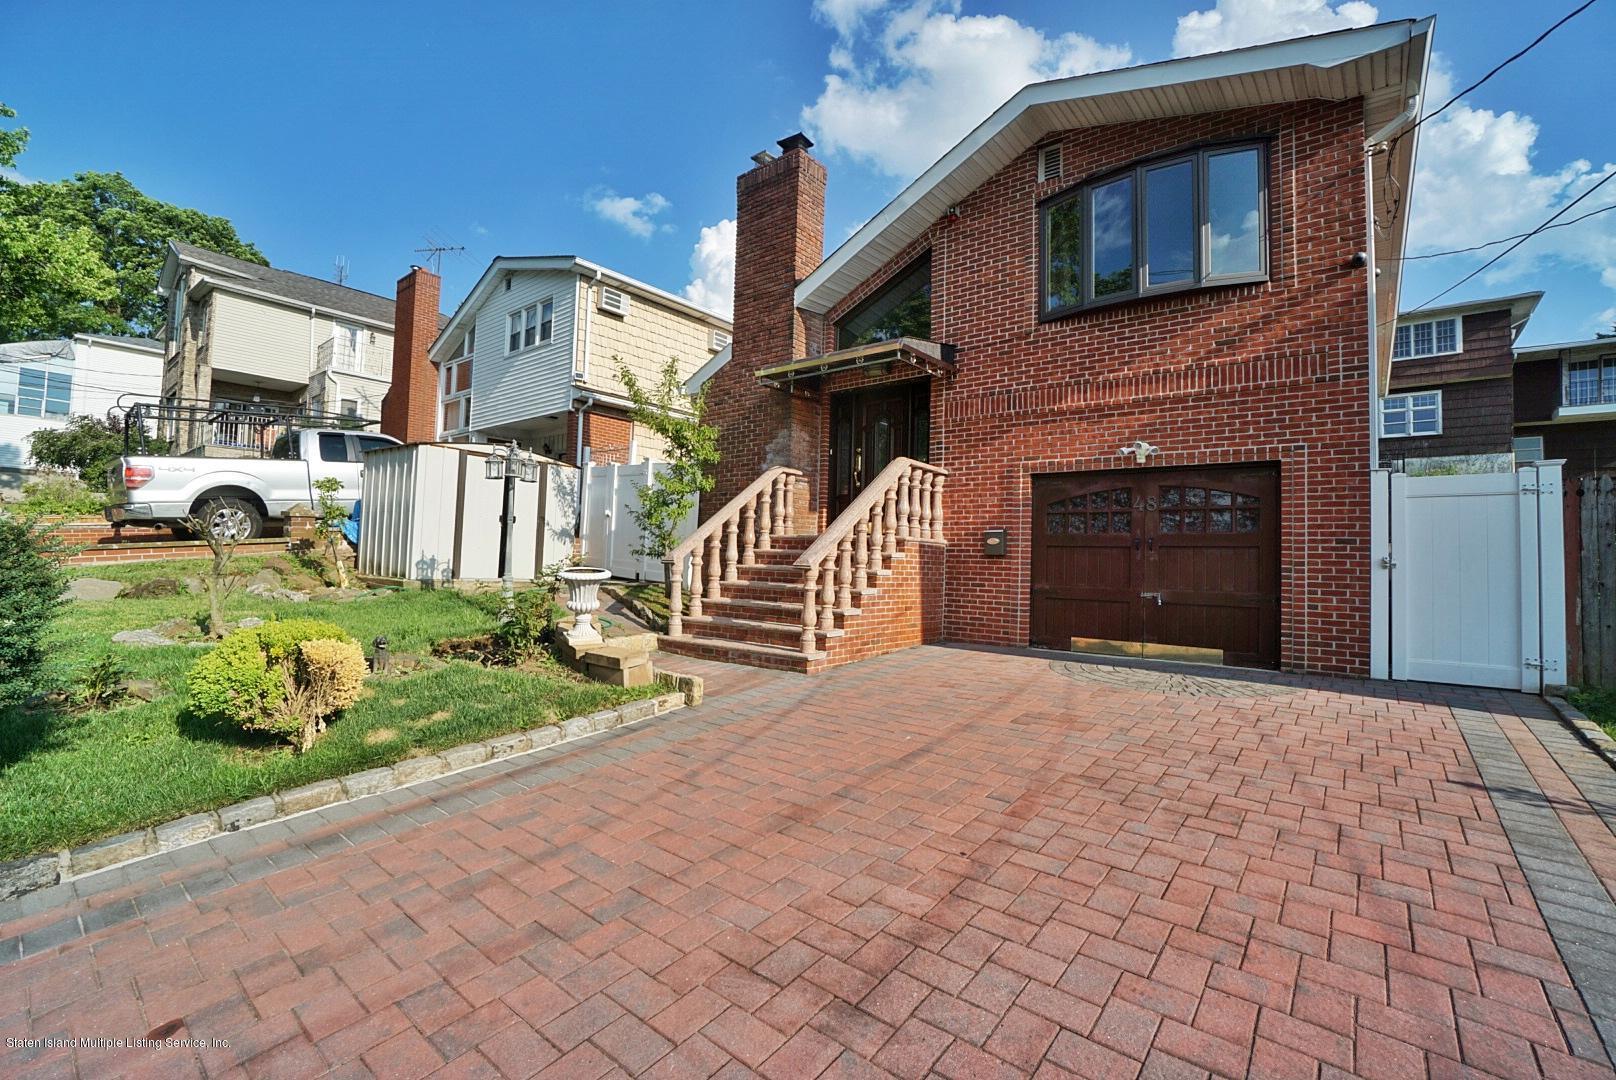 Single Family - Detached 48 Ocean Terrace  Staten Island, NY 10314, MLS-1130826-2